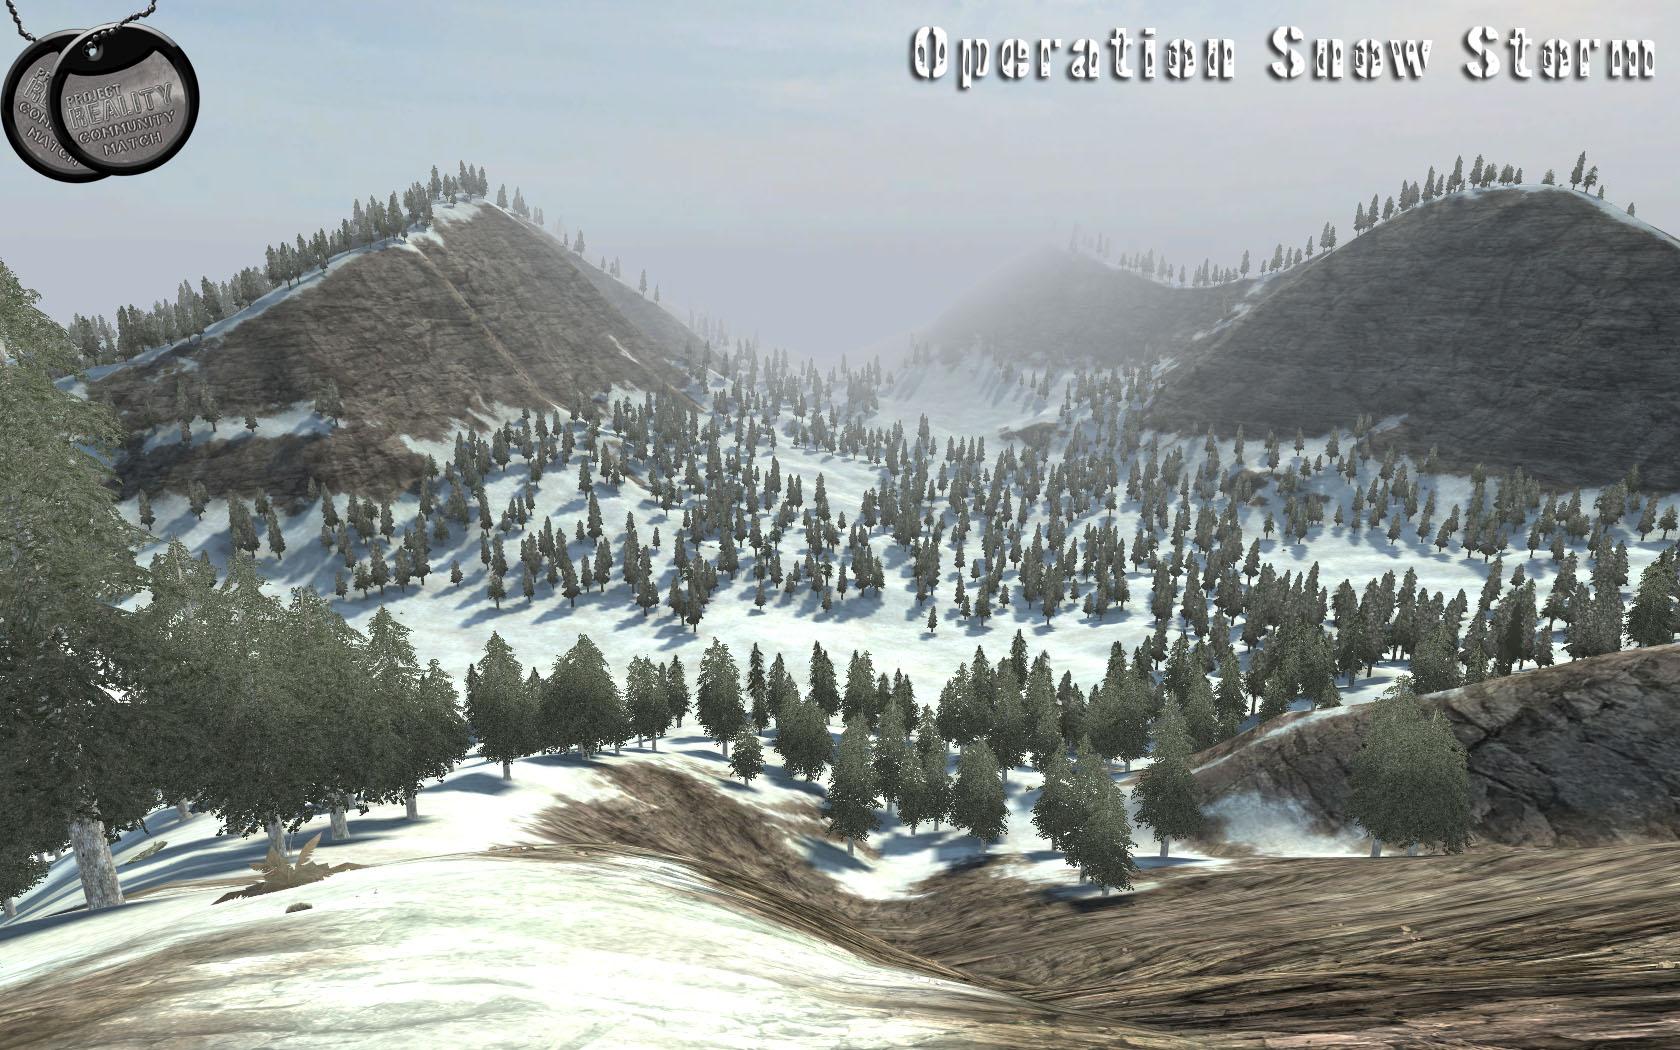 Operation Snow Storm! Oss1